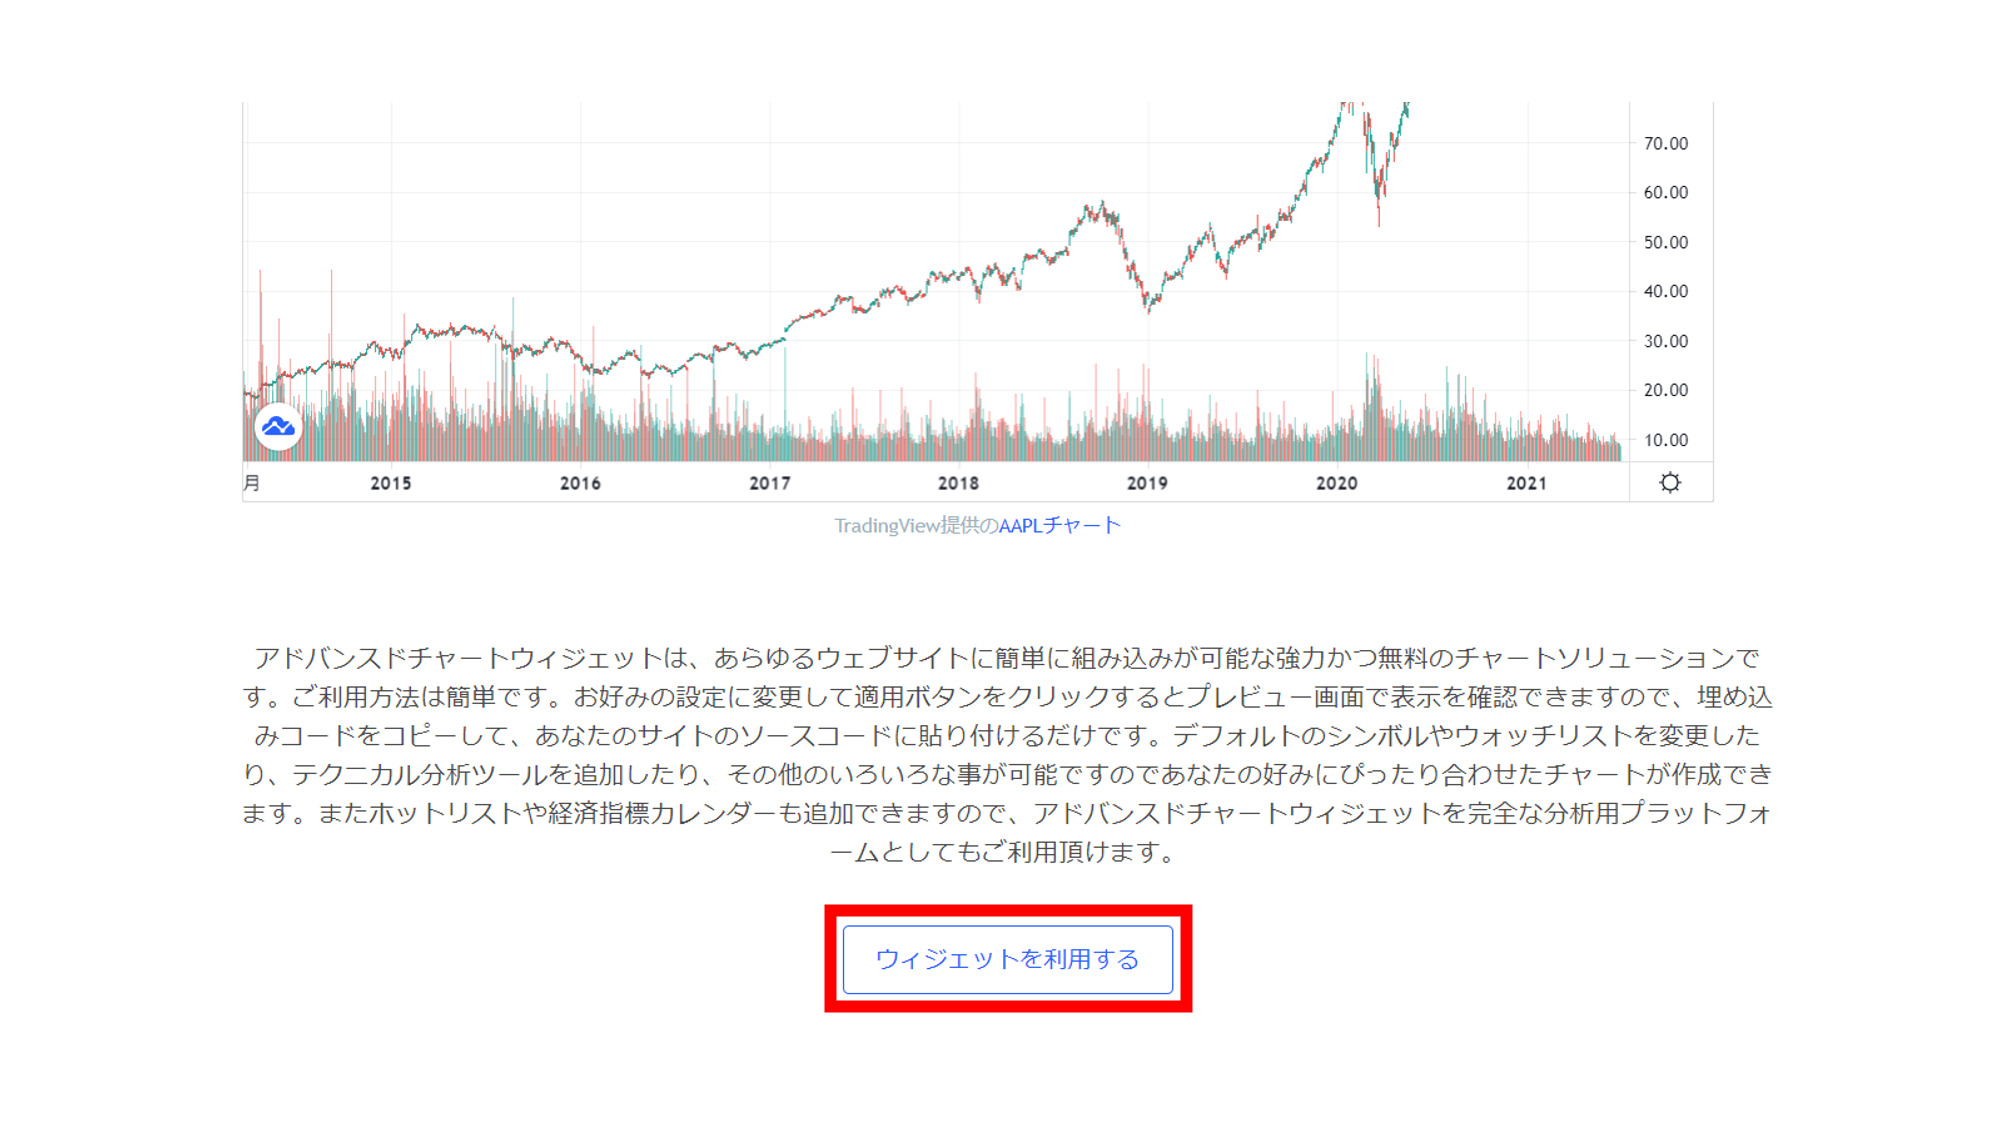 Tradingview-リアルタームチャートの作成-1